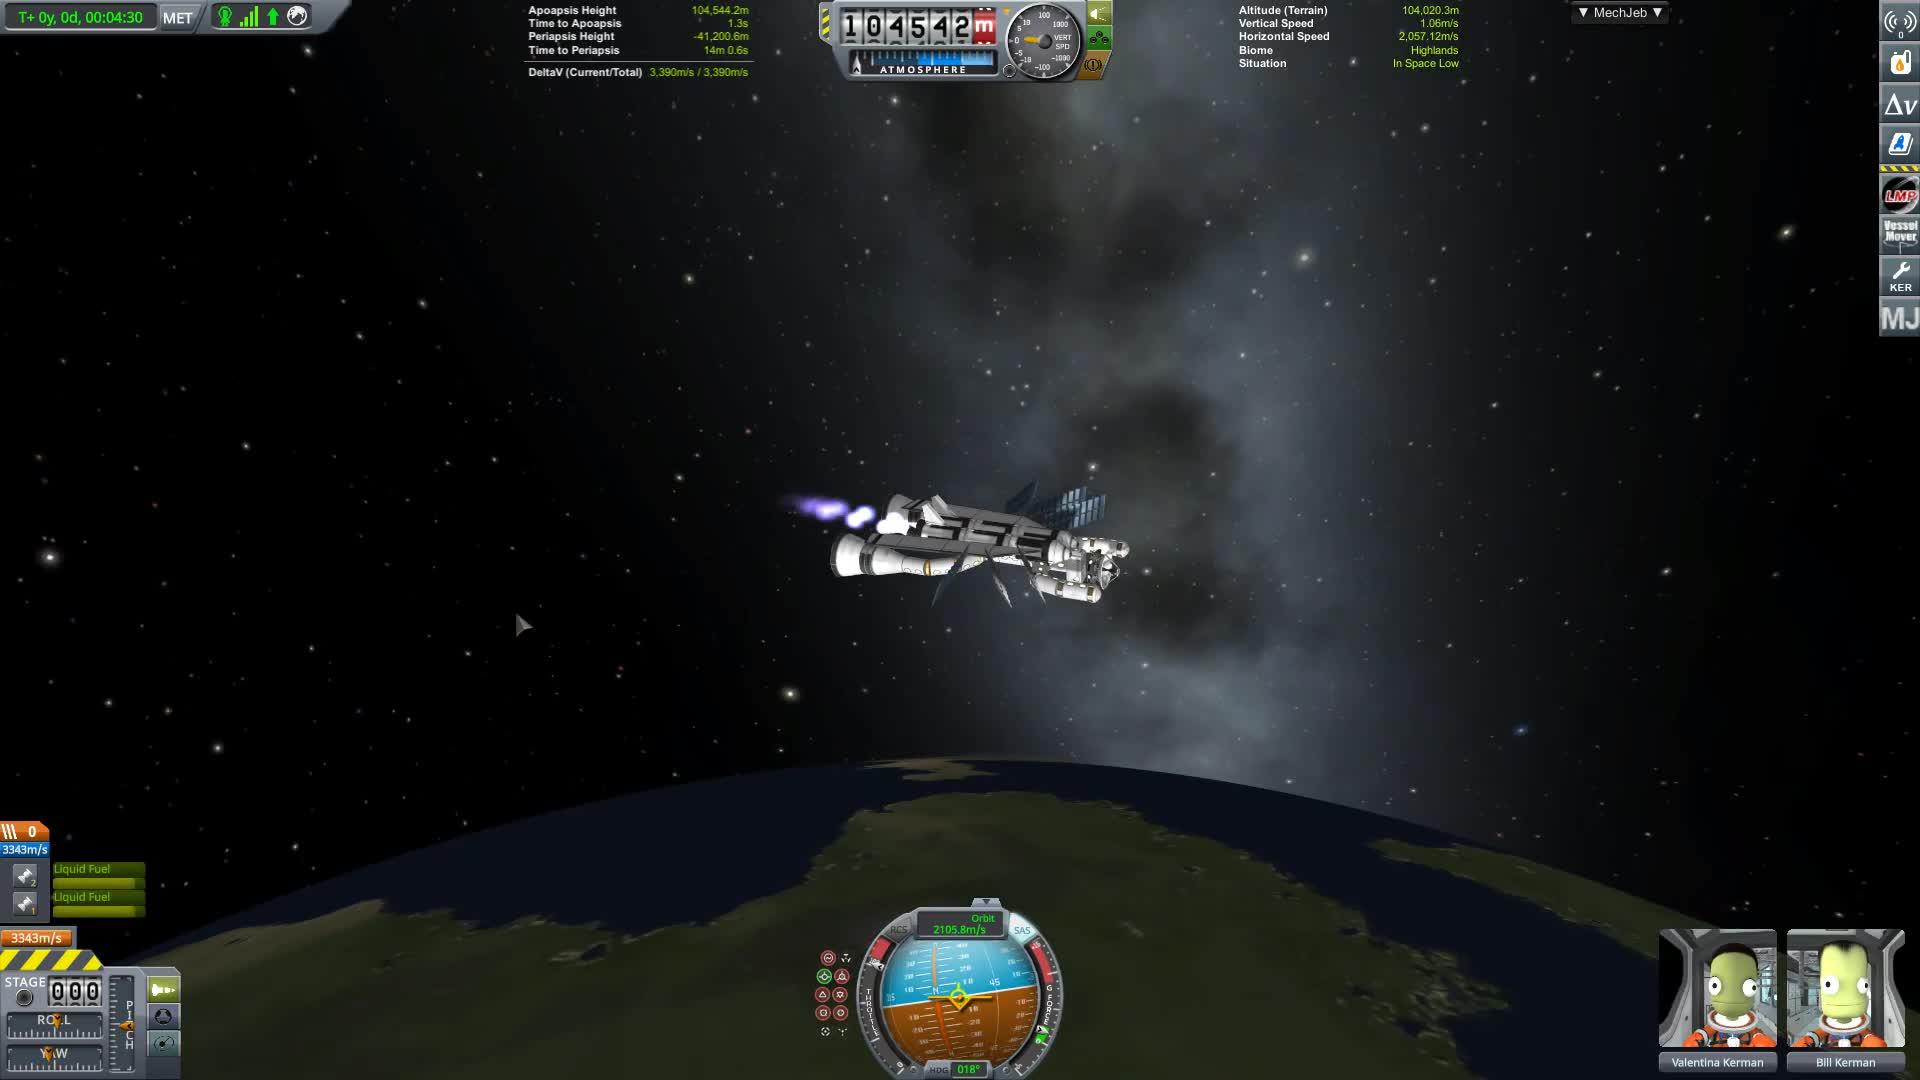 Game Play, Gameplay, JPlays, Jatwaa, KSP, Kerbal, Program, Space, funny, youtuber, Kerbal Space Program | Building and Launching StarMan Station GIFs